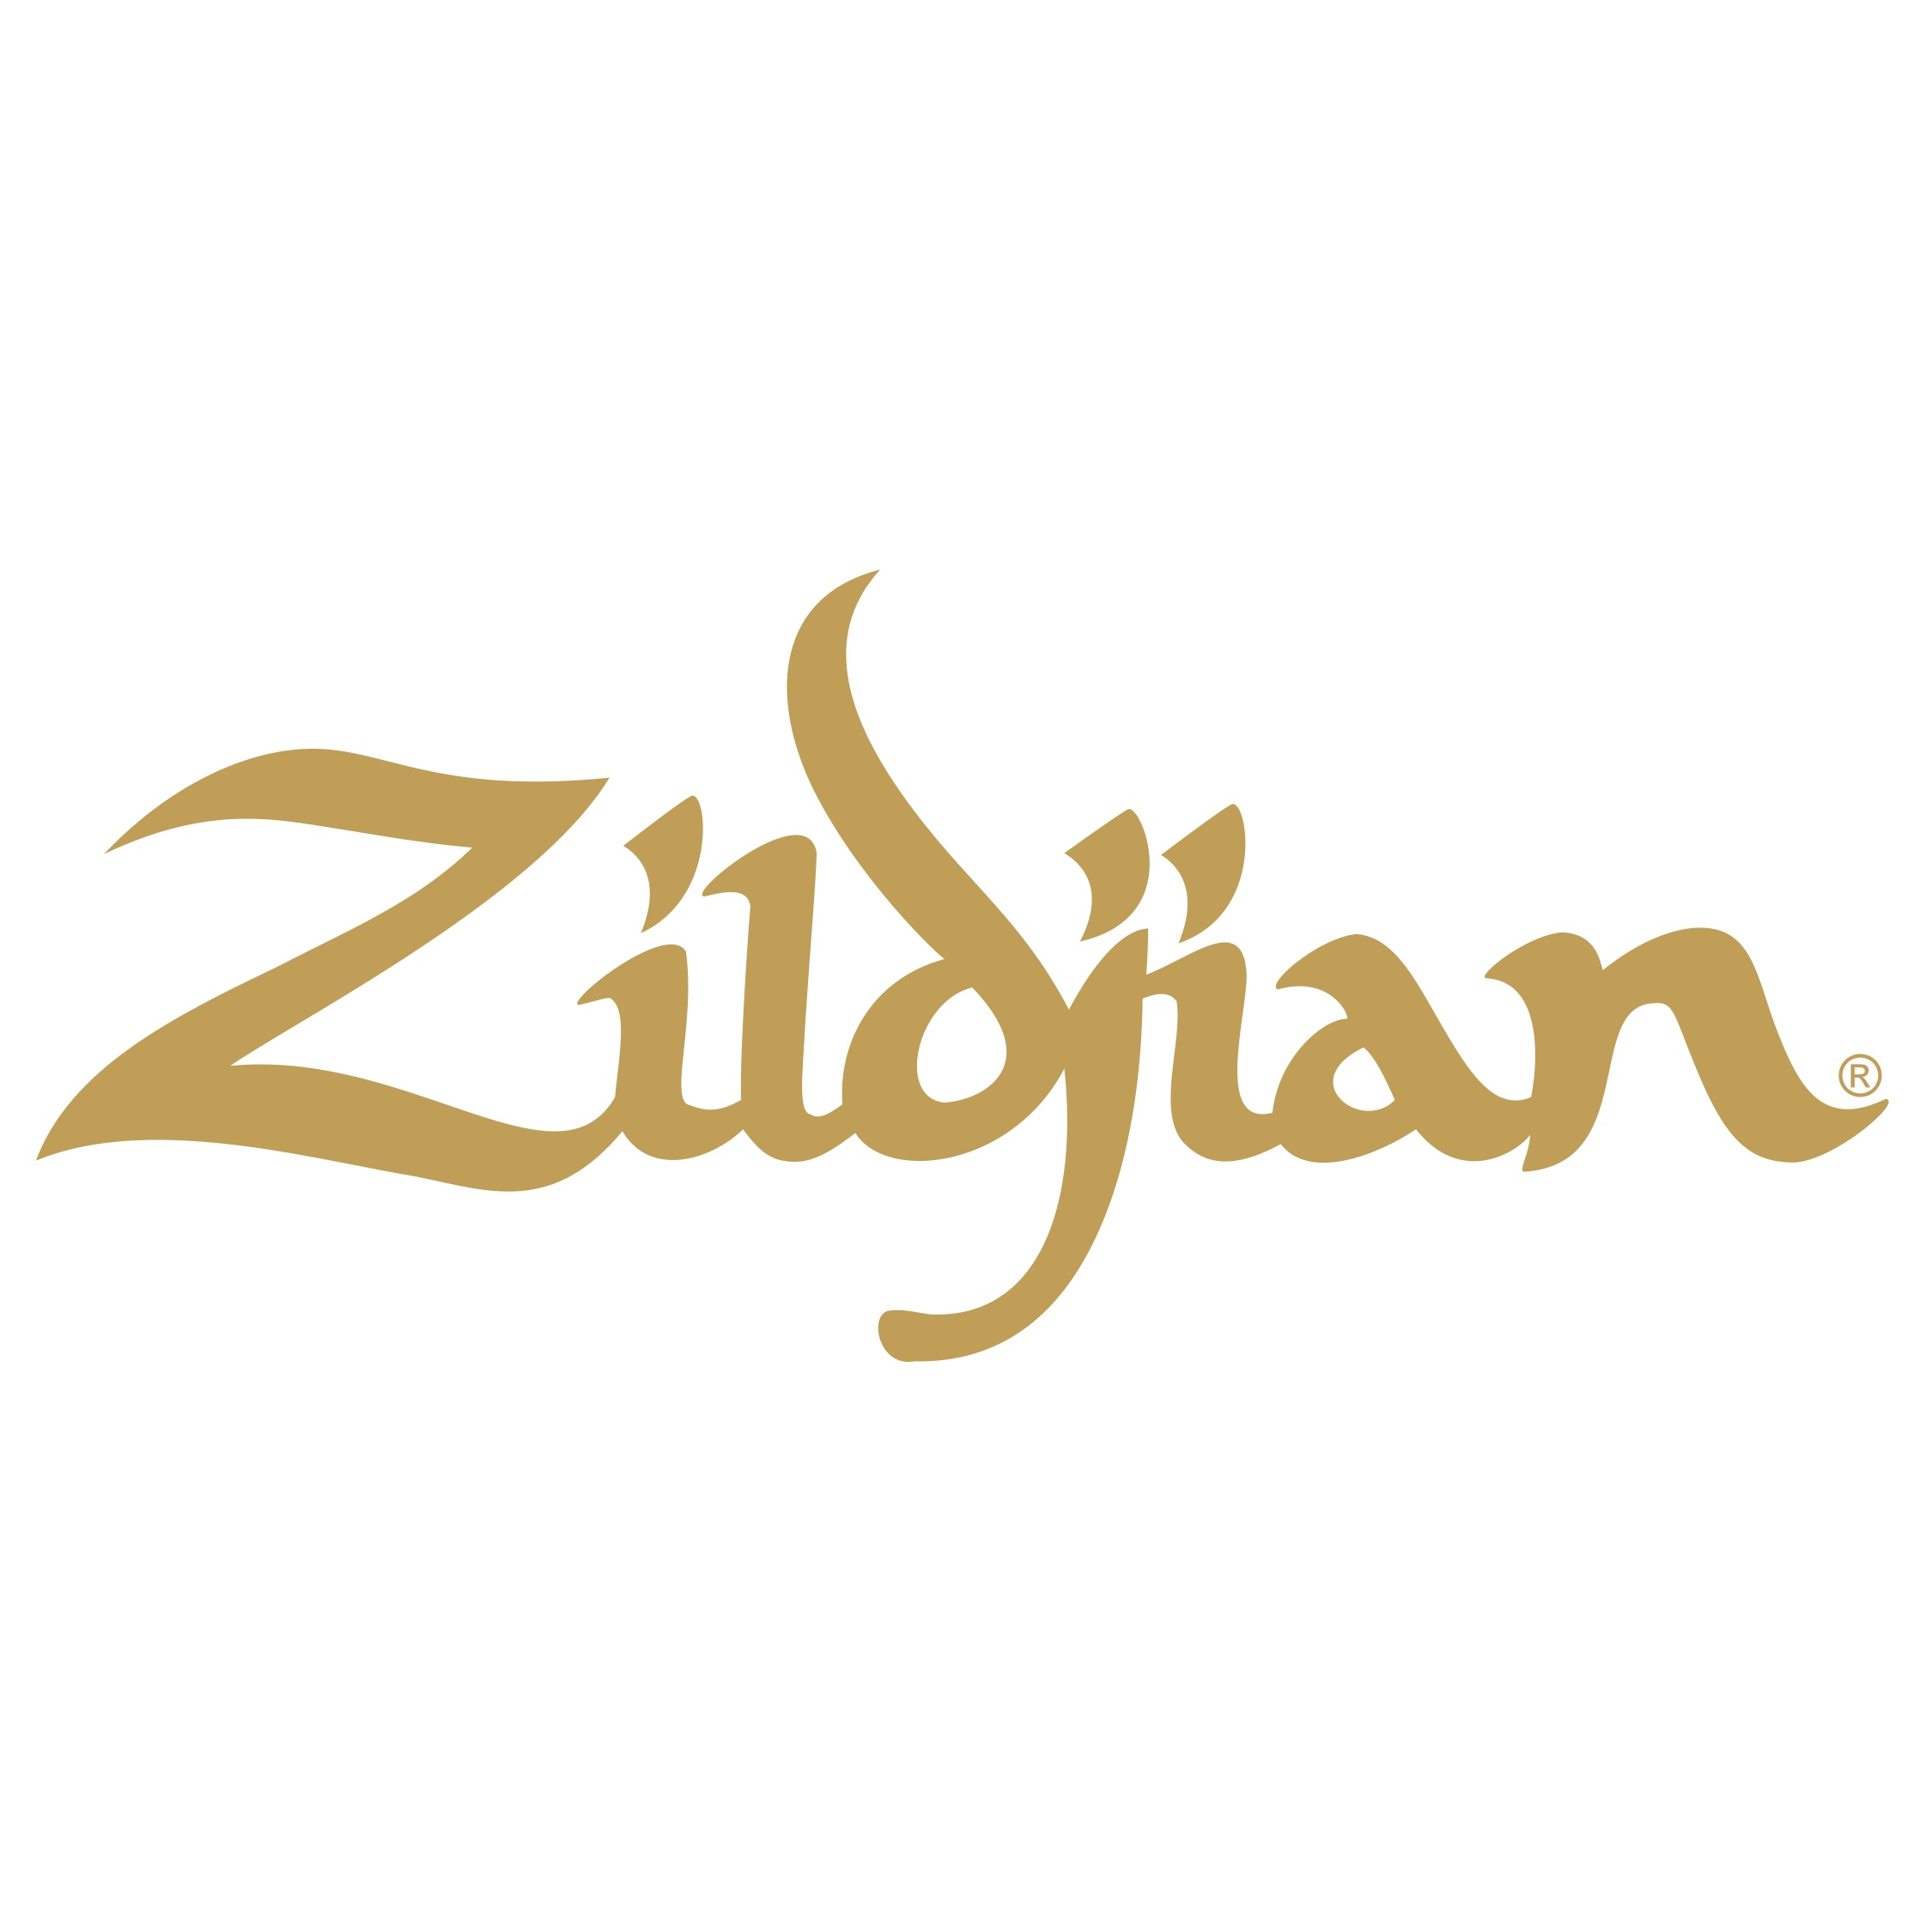 Zildjian+Gold+Logo.jpg